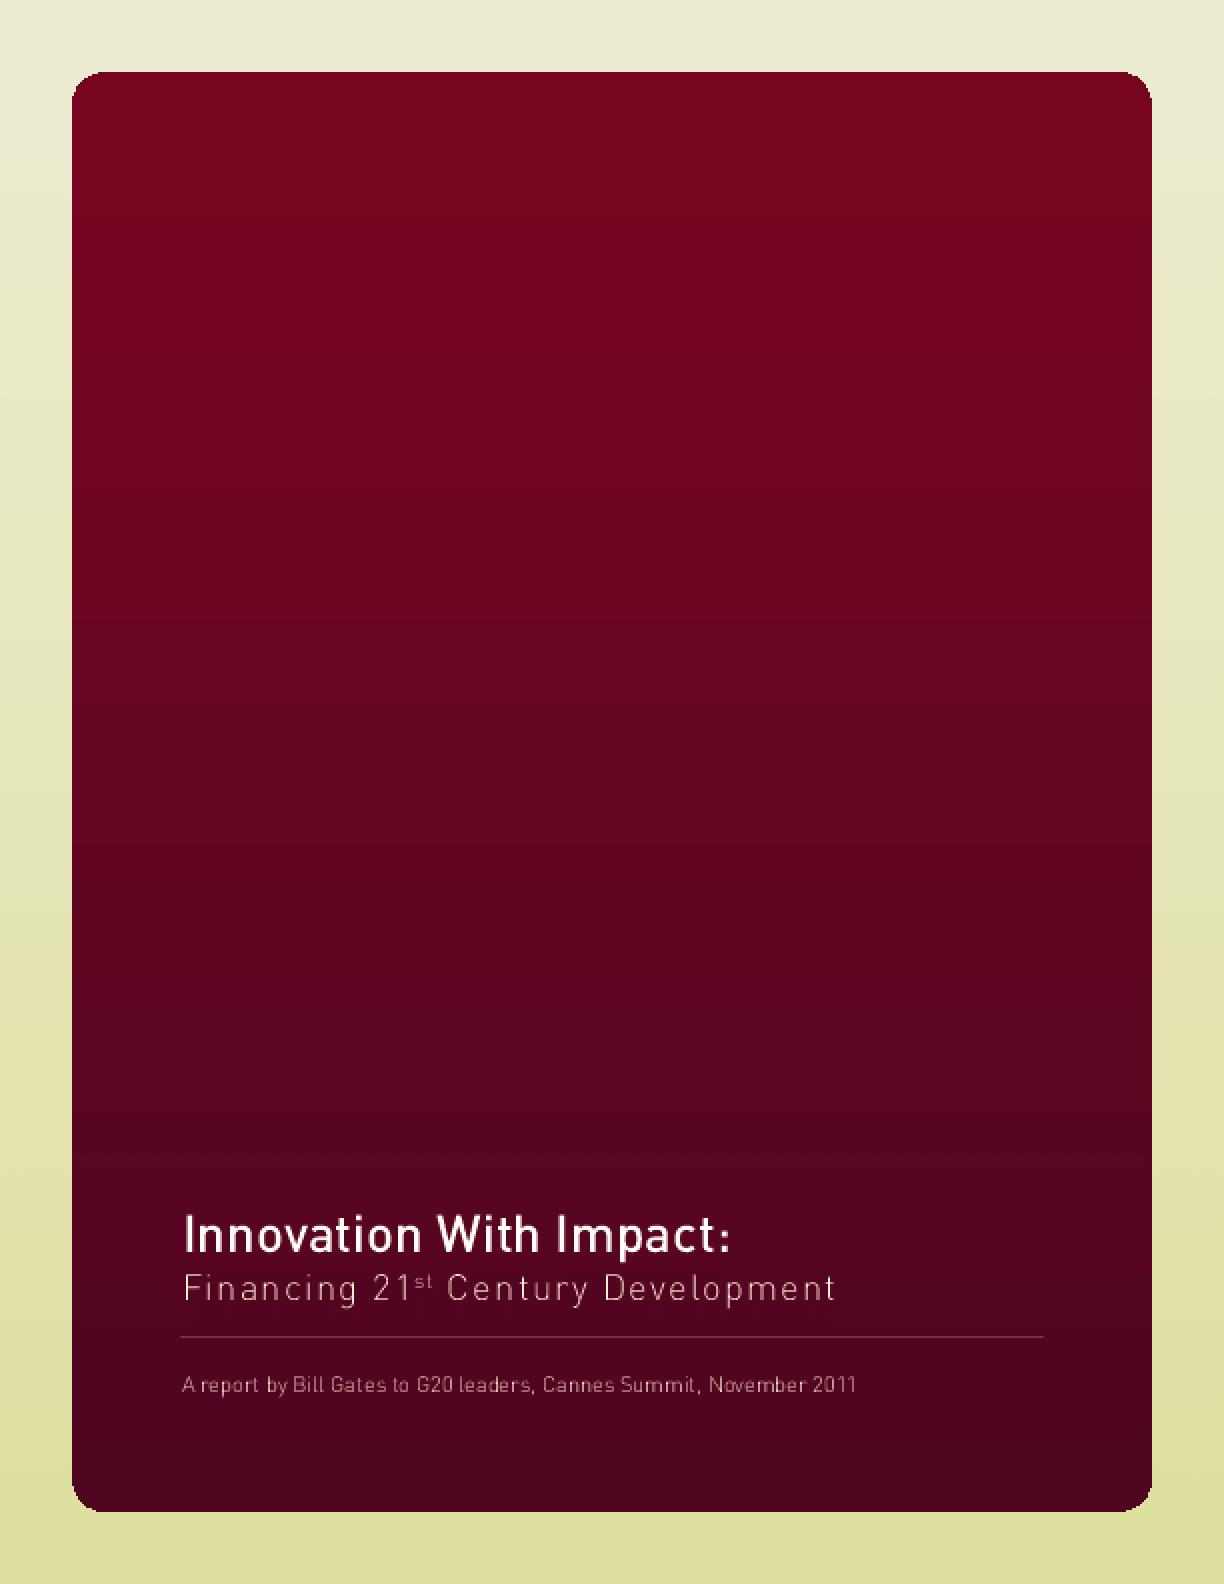 Innovation With Impact: Financing 21st Century Development